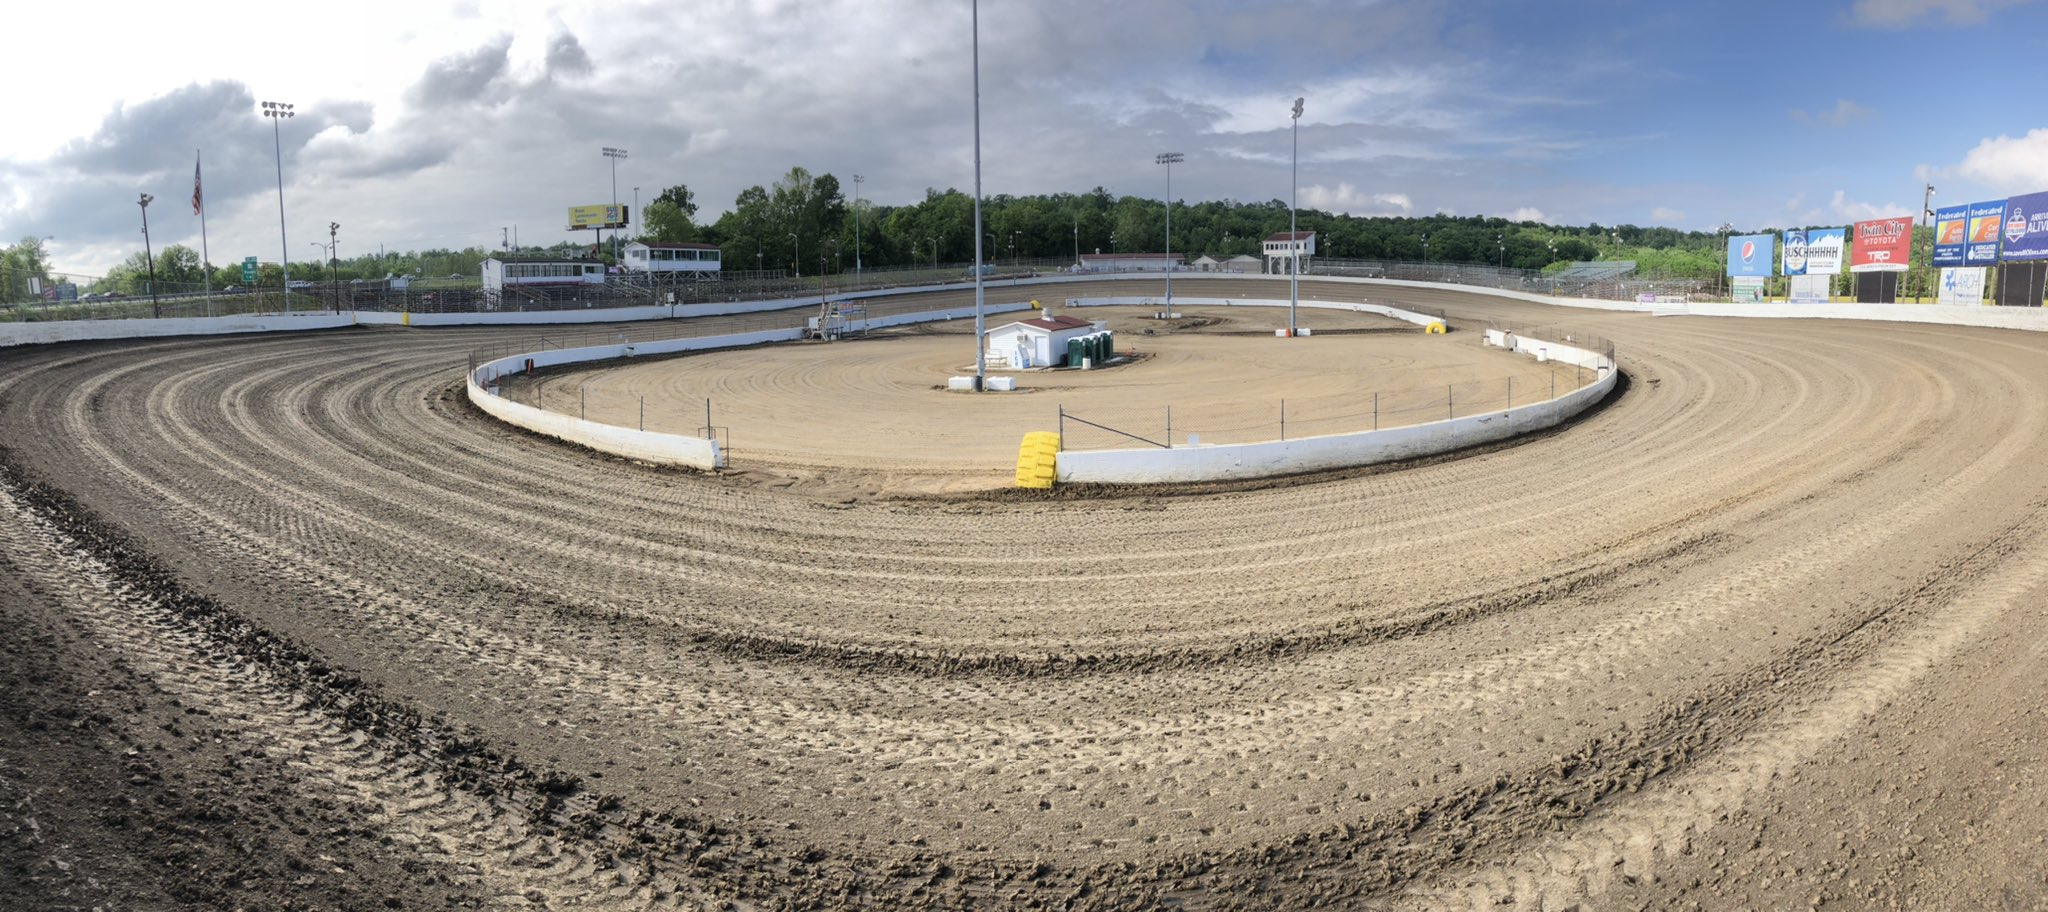 Federated Auto Park Raceway - I-55 Raceway